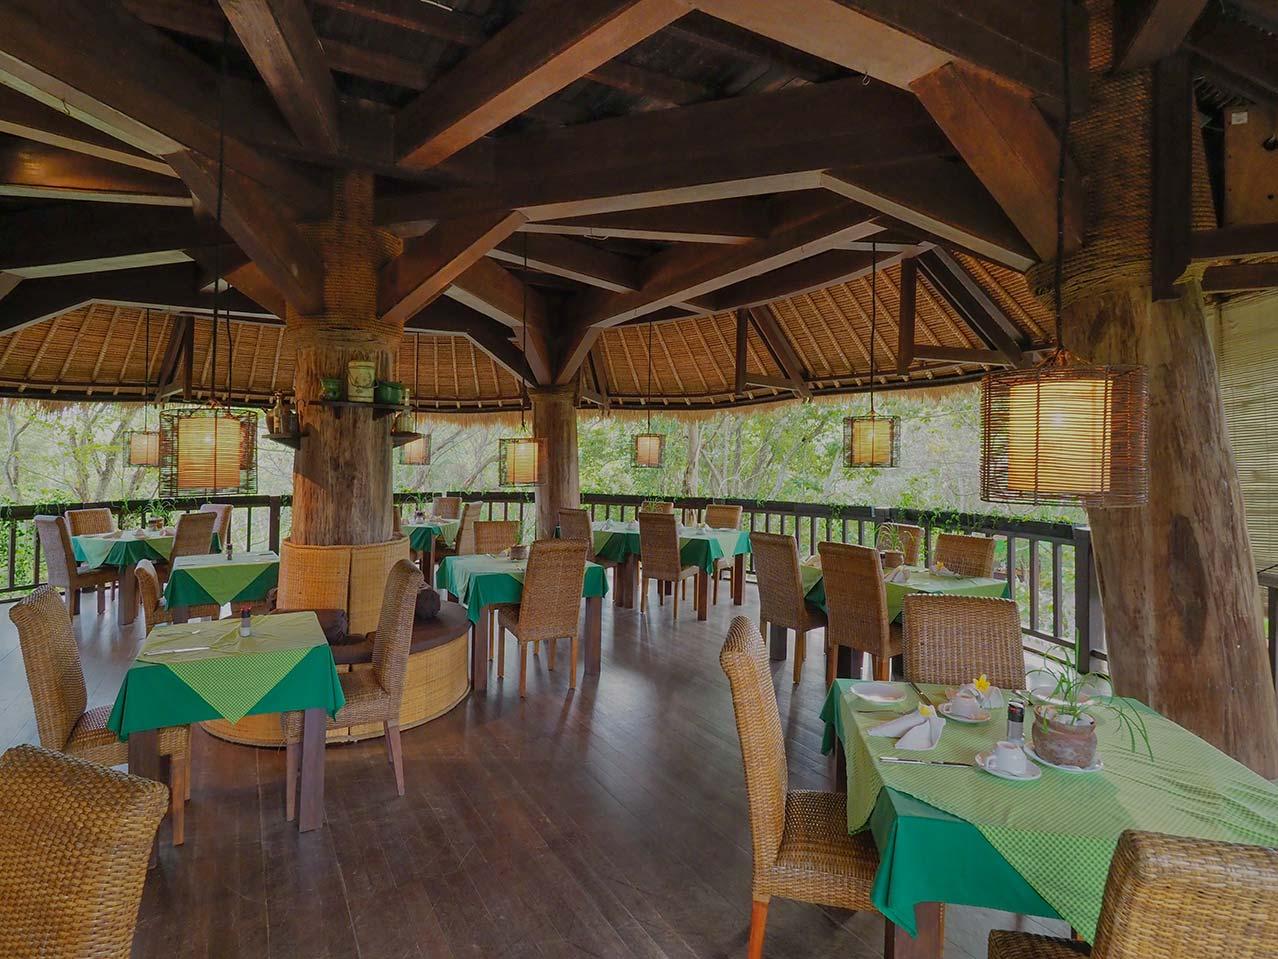 Bali_Tower_dining_set_up.jpg